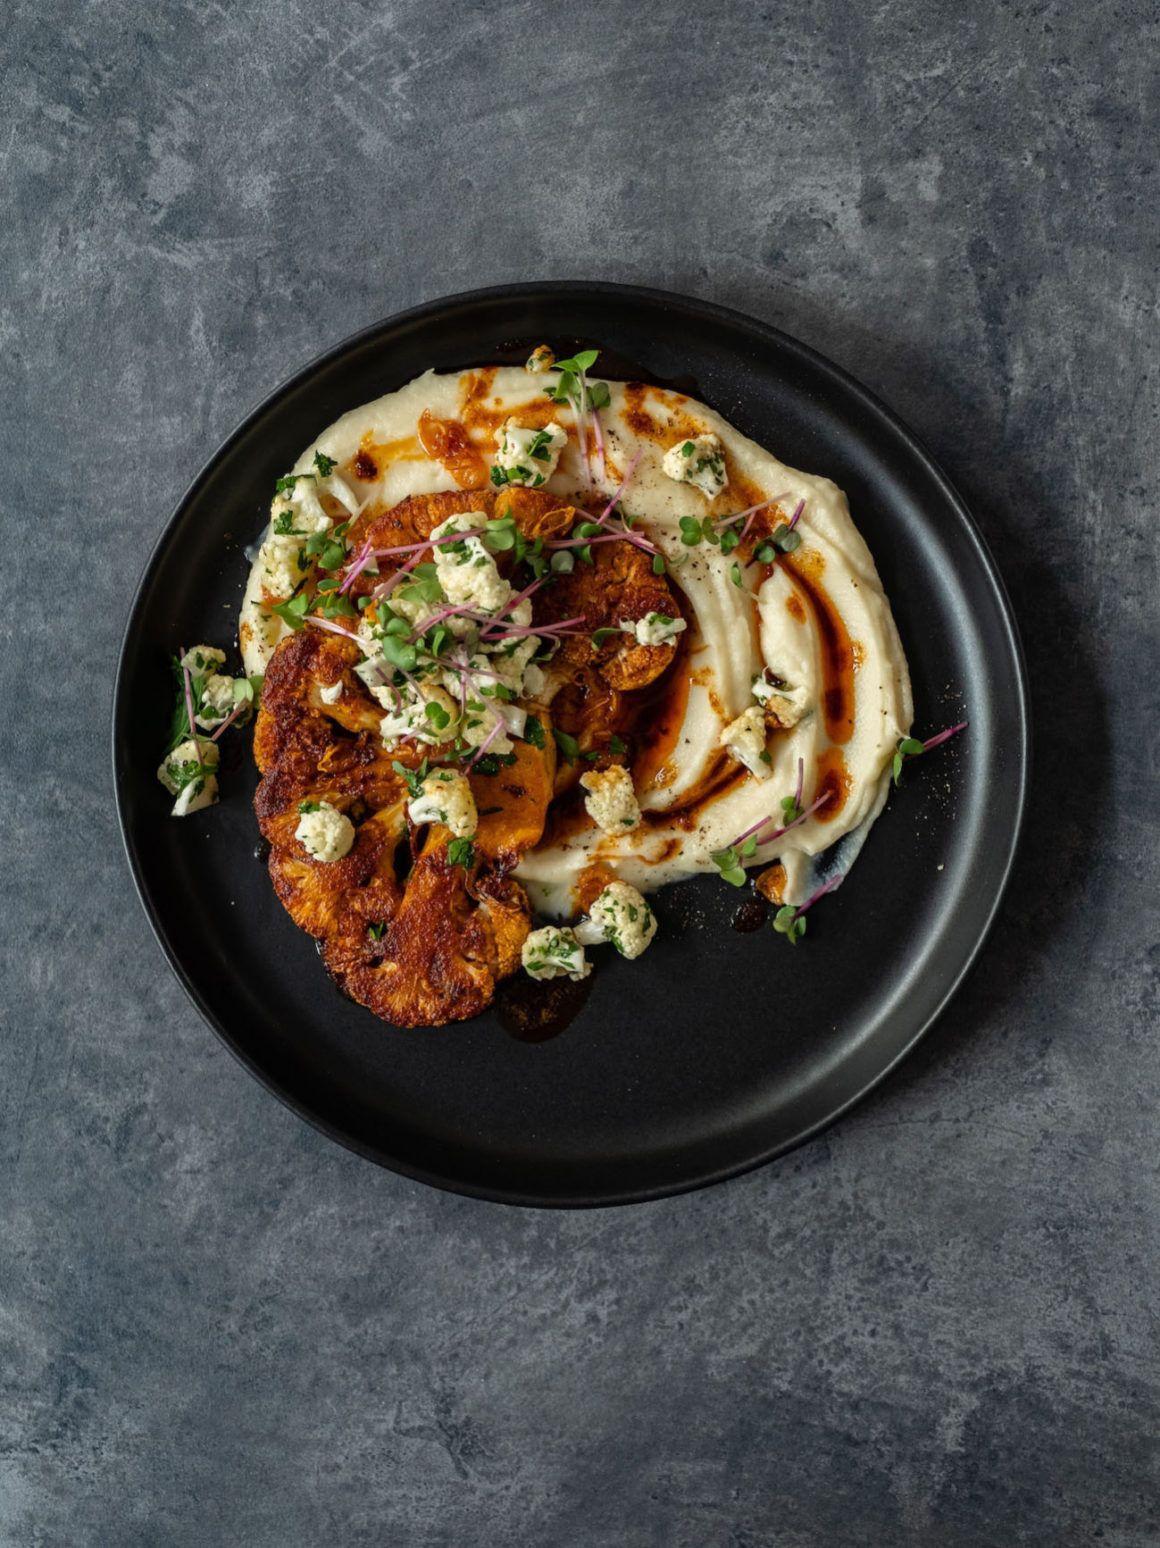 Foodblog, Rezept Blumenkohl Dreierlei, Teller, Steak, Püree, Salat, Kresse